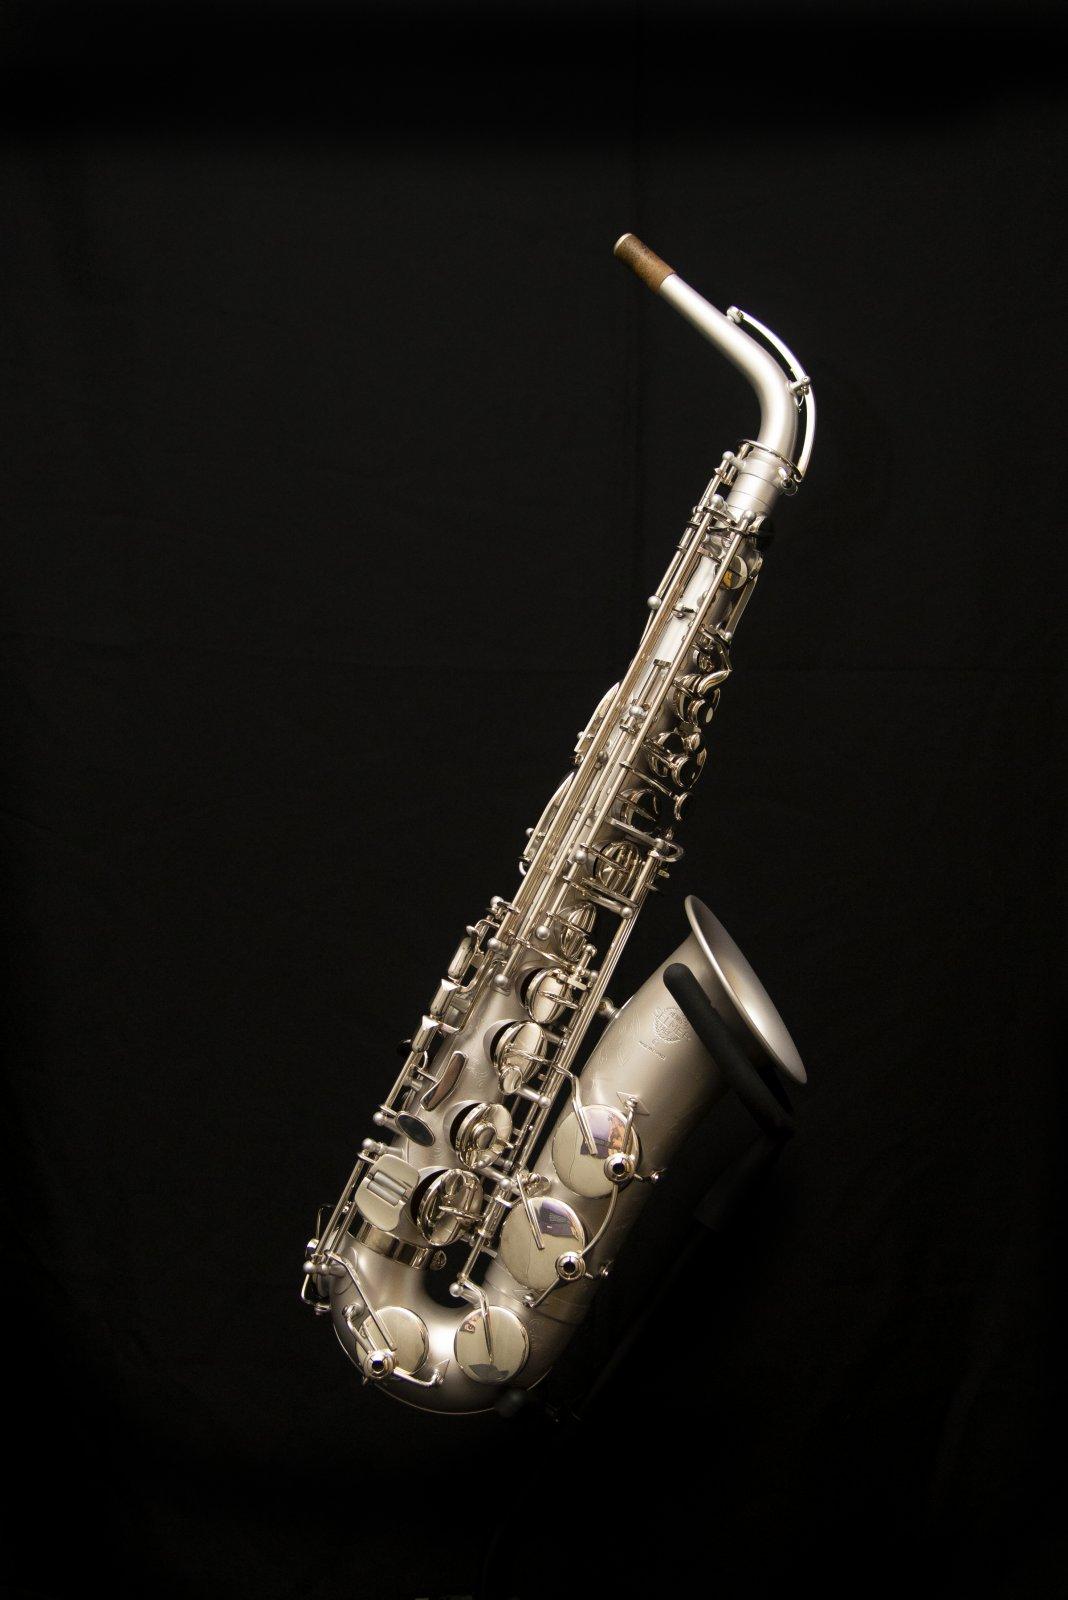 Selmer Paris Limited Edition Alto Saxophone